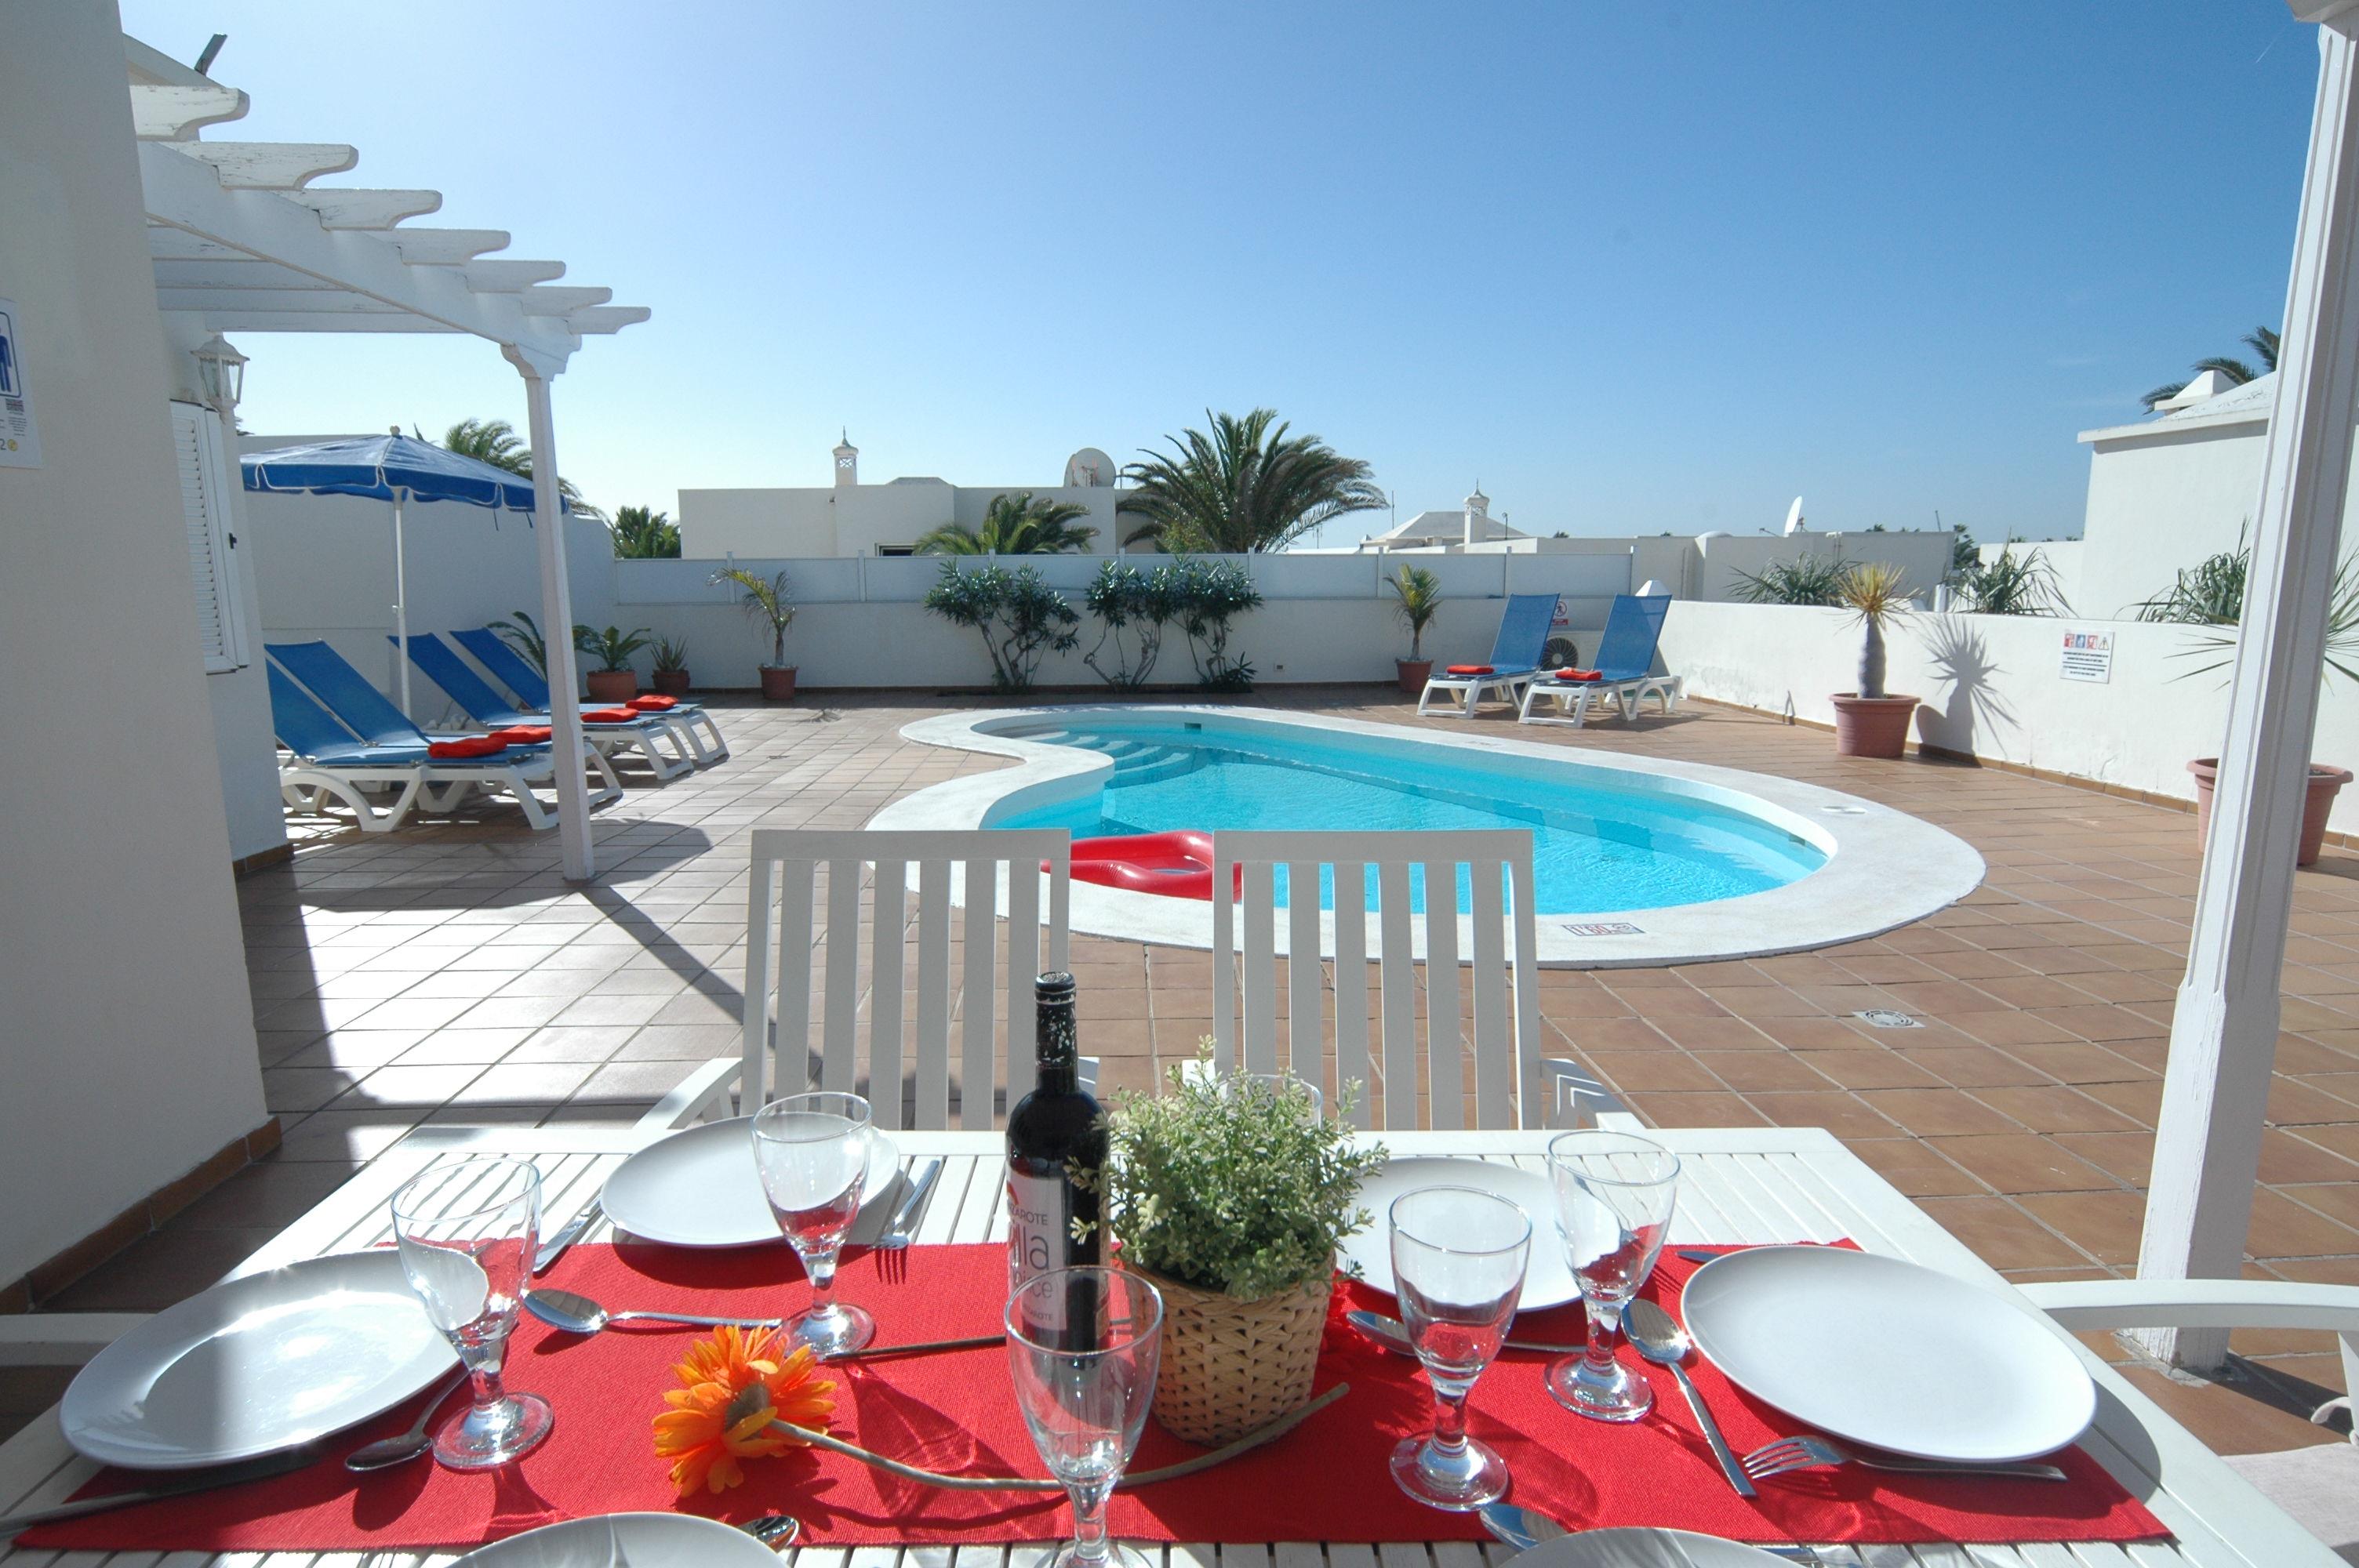 LVC311571 Villa with 3 bedrooms in Matagorda